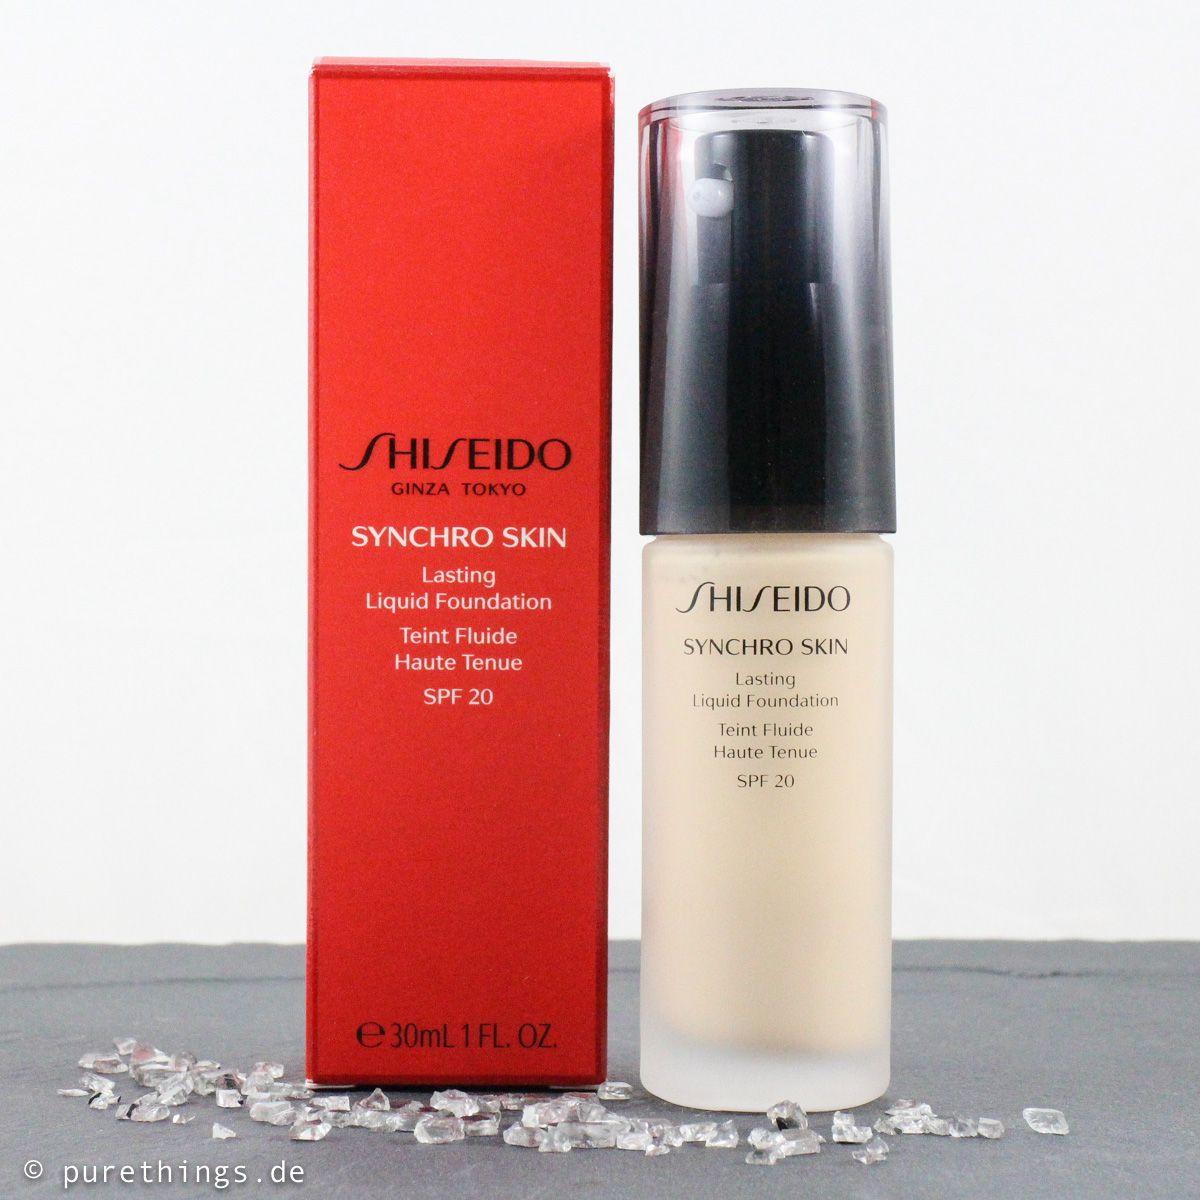 SommerFoundation Shiseido Synchro Skin Lasting Liquid